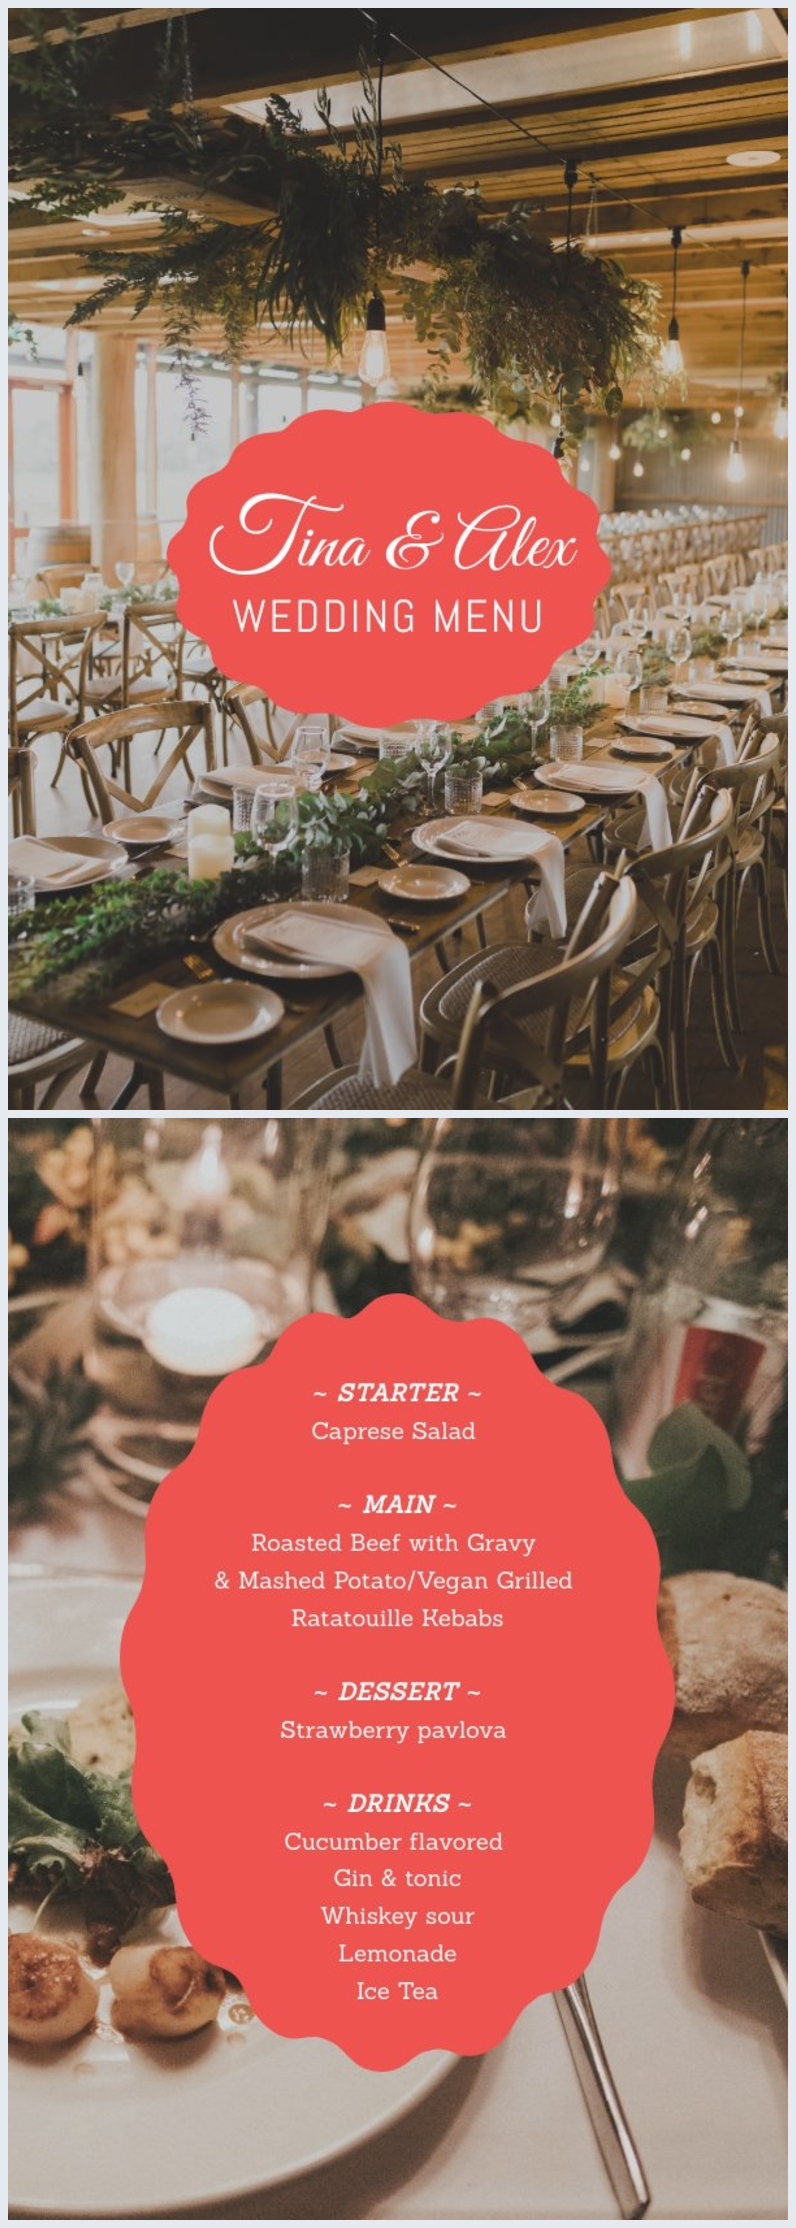 Plantilla para carta menú de bodas